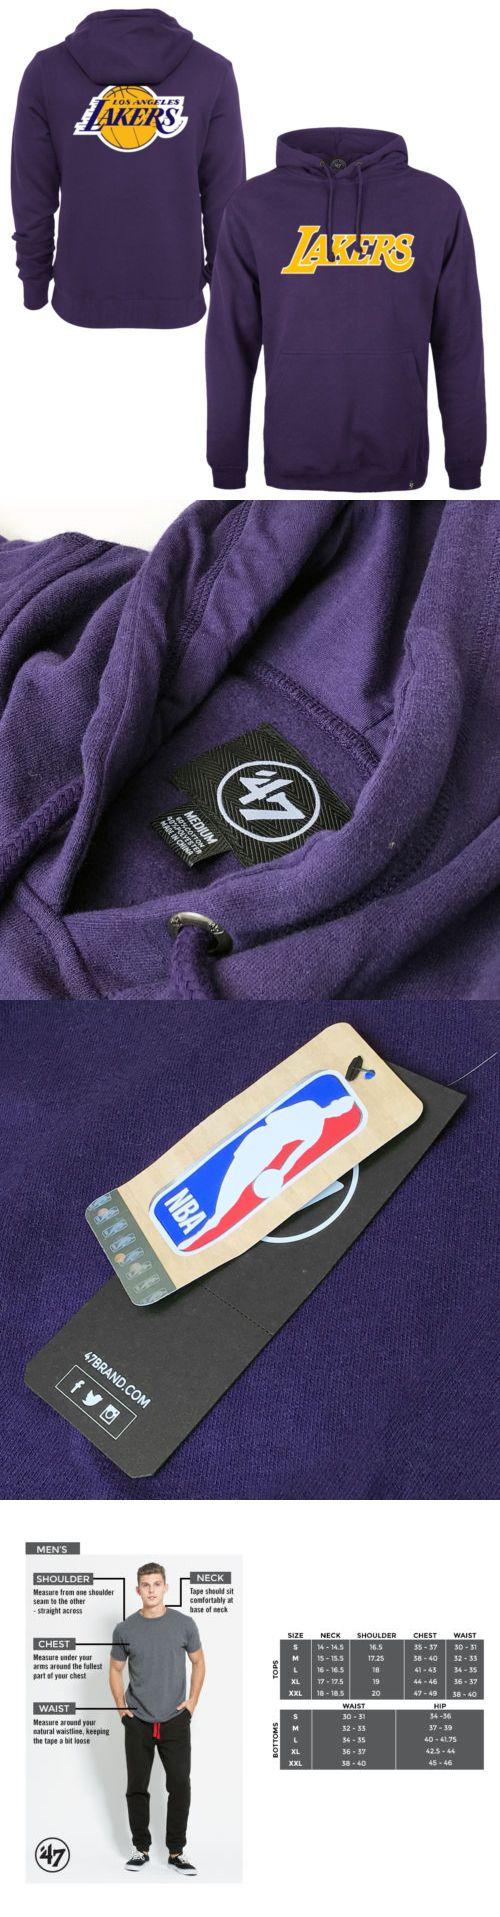 Other Basketball Clothing 158974: Los Angeles Lakers 47 Nba Mvp Headline Hoodie Jumper - Purple -> BUY IT NOW ONLY: $89.95 on eBay!